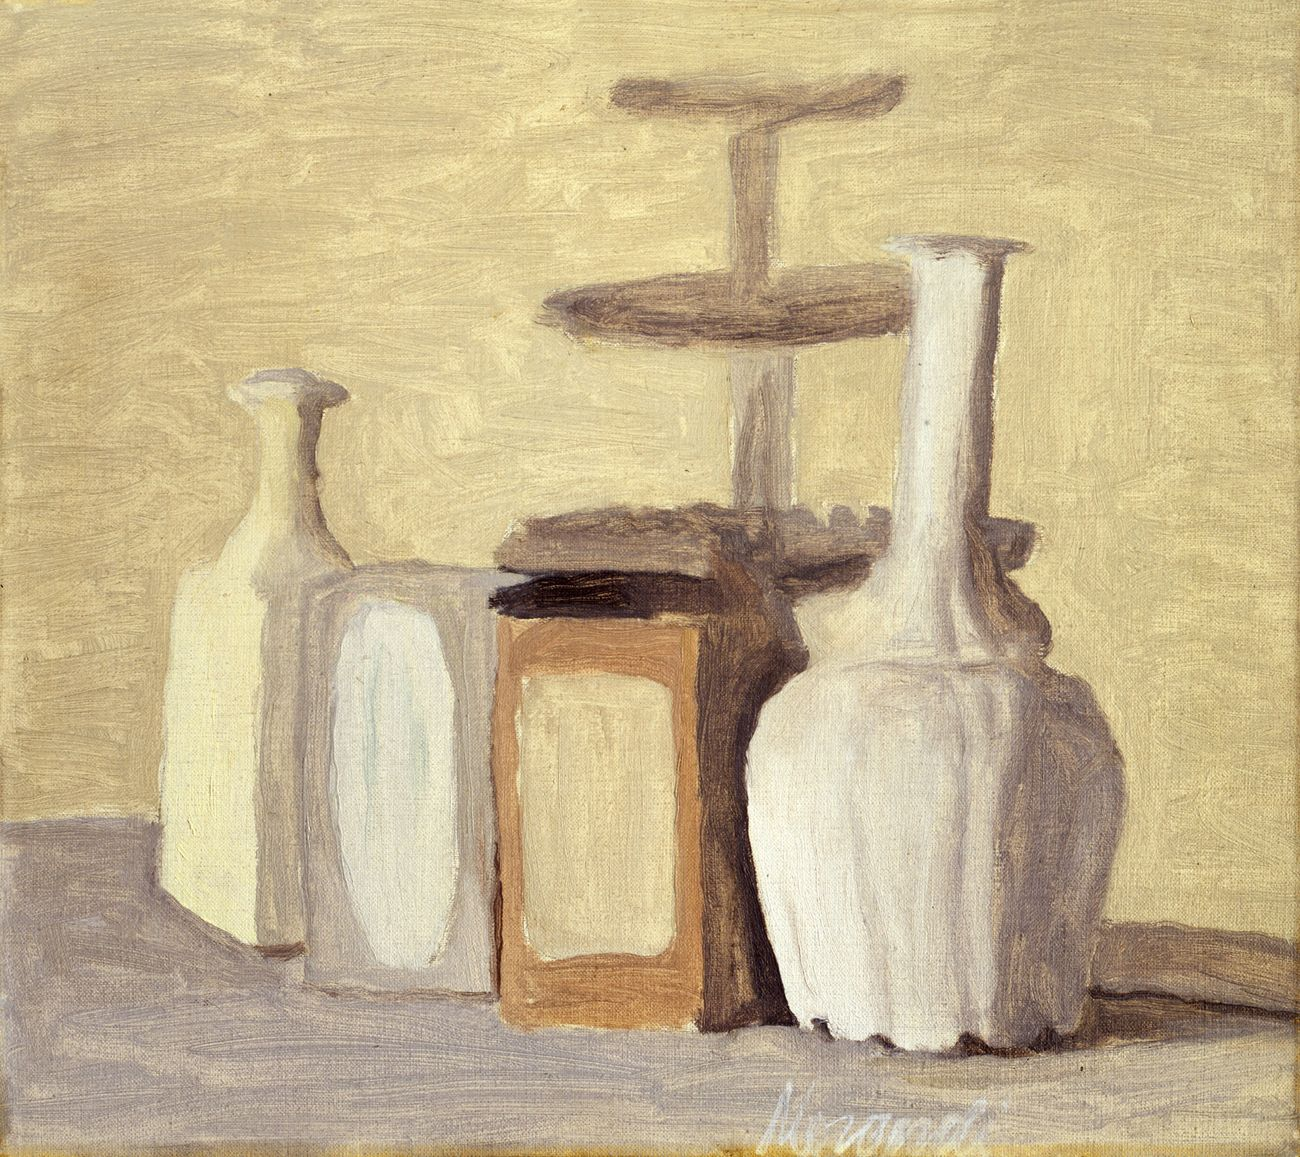 Giorgio Morandi, Vasi e bottiglie, 1948. Olio su tela, 35,4 x 40,5 cm. MUVE, Ca' Pesaro – Galleria Internazionale d'Arte Moderna. Courtesy MUVE, Venezia